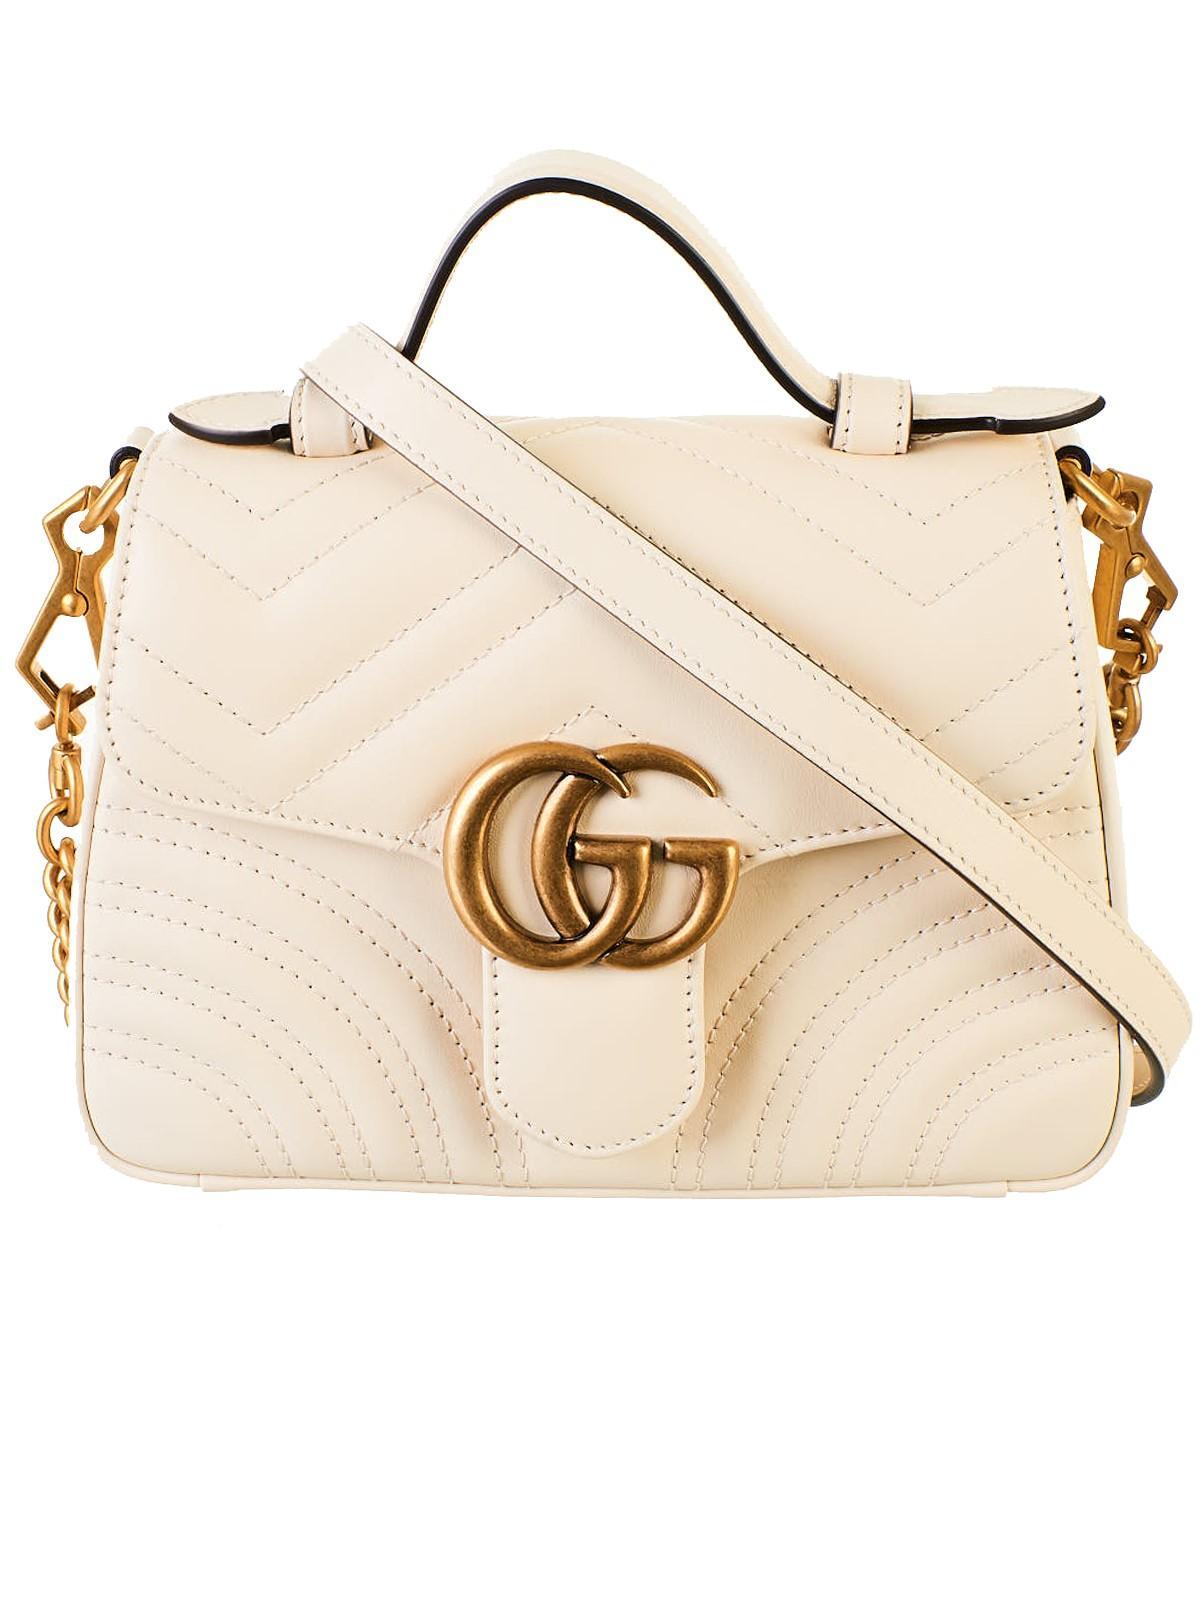 95d11d5dda7 Gucci Borsa GG Marmont Bianca in Natural - Lyst